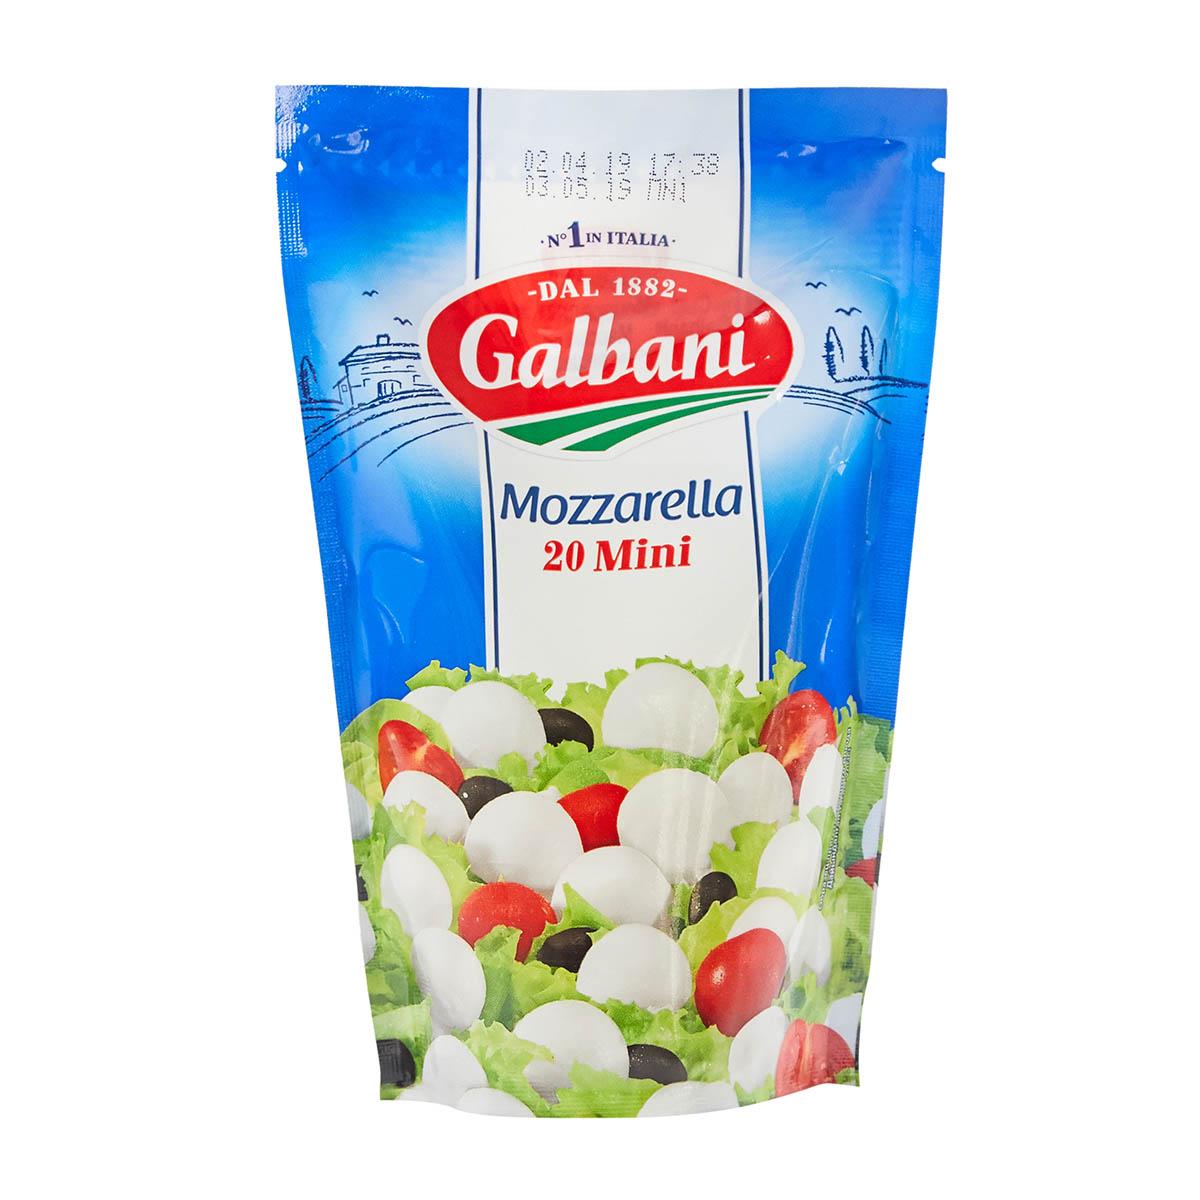 Galbani 45% мини-моцарелла